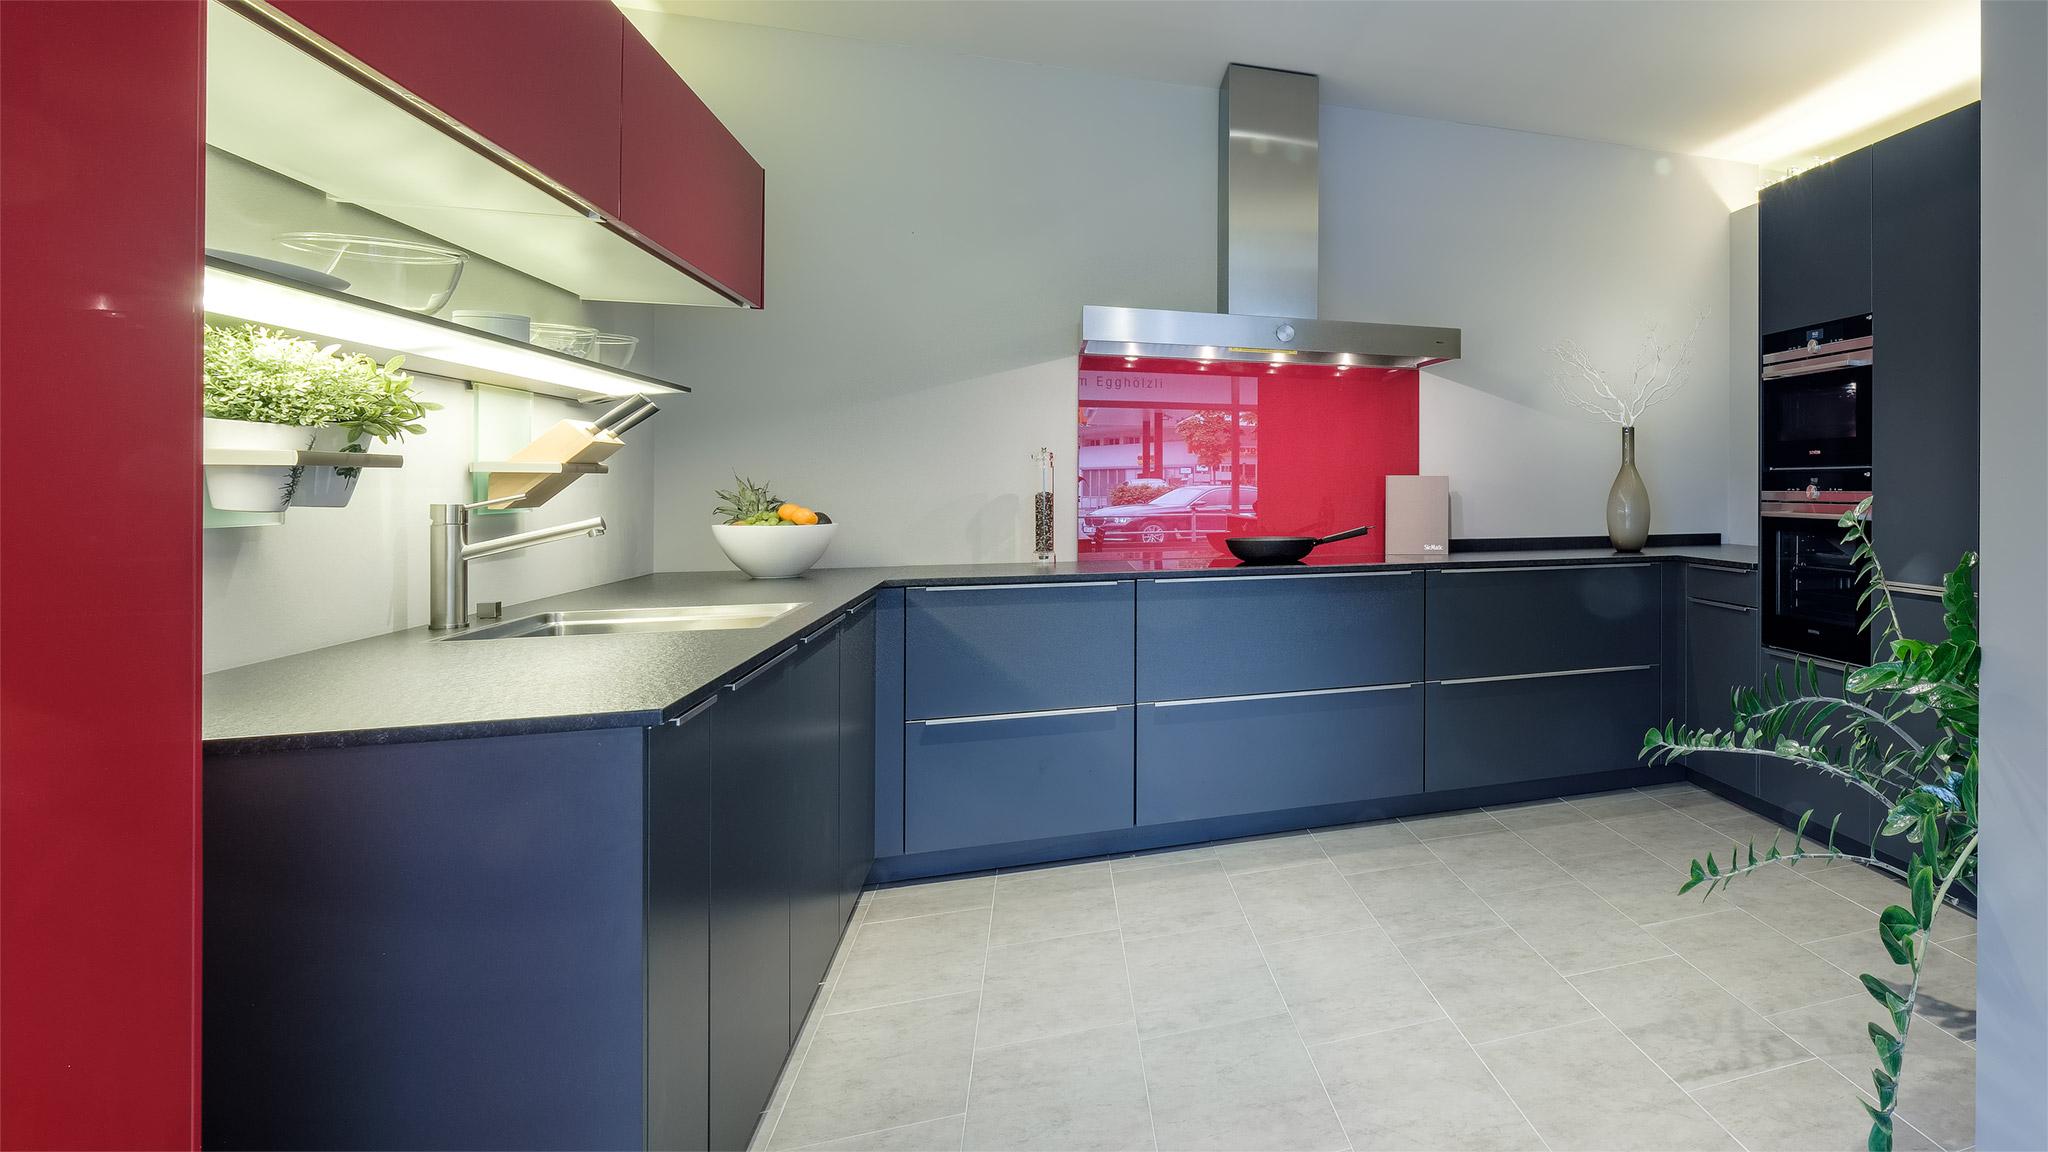 Großartig Bartheke Für Küche Fotos - Heimat Ideen ...